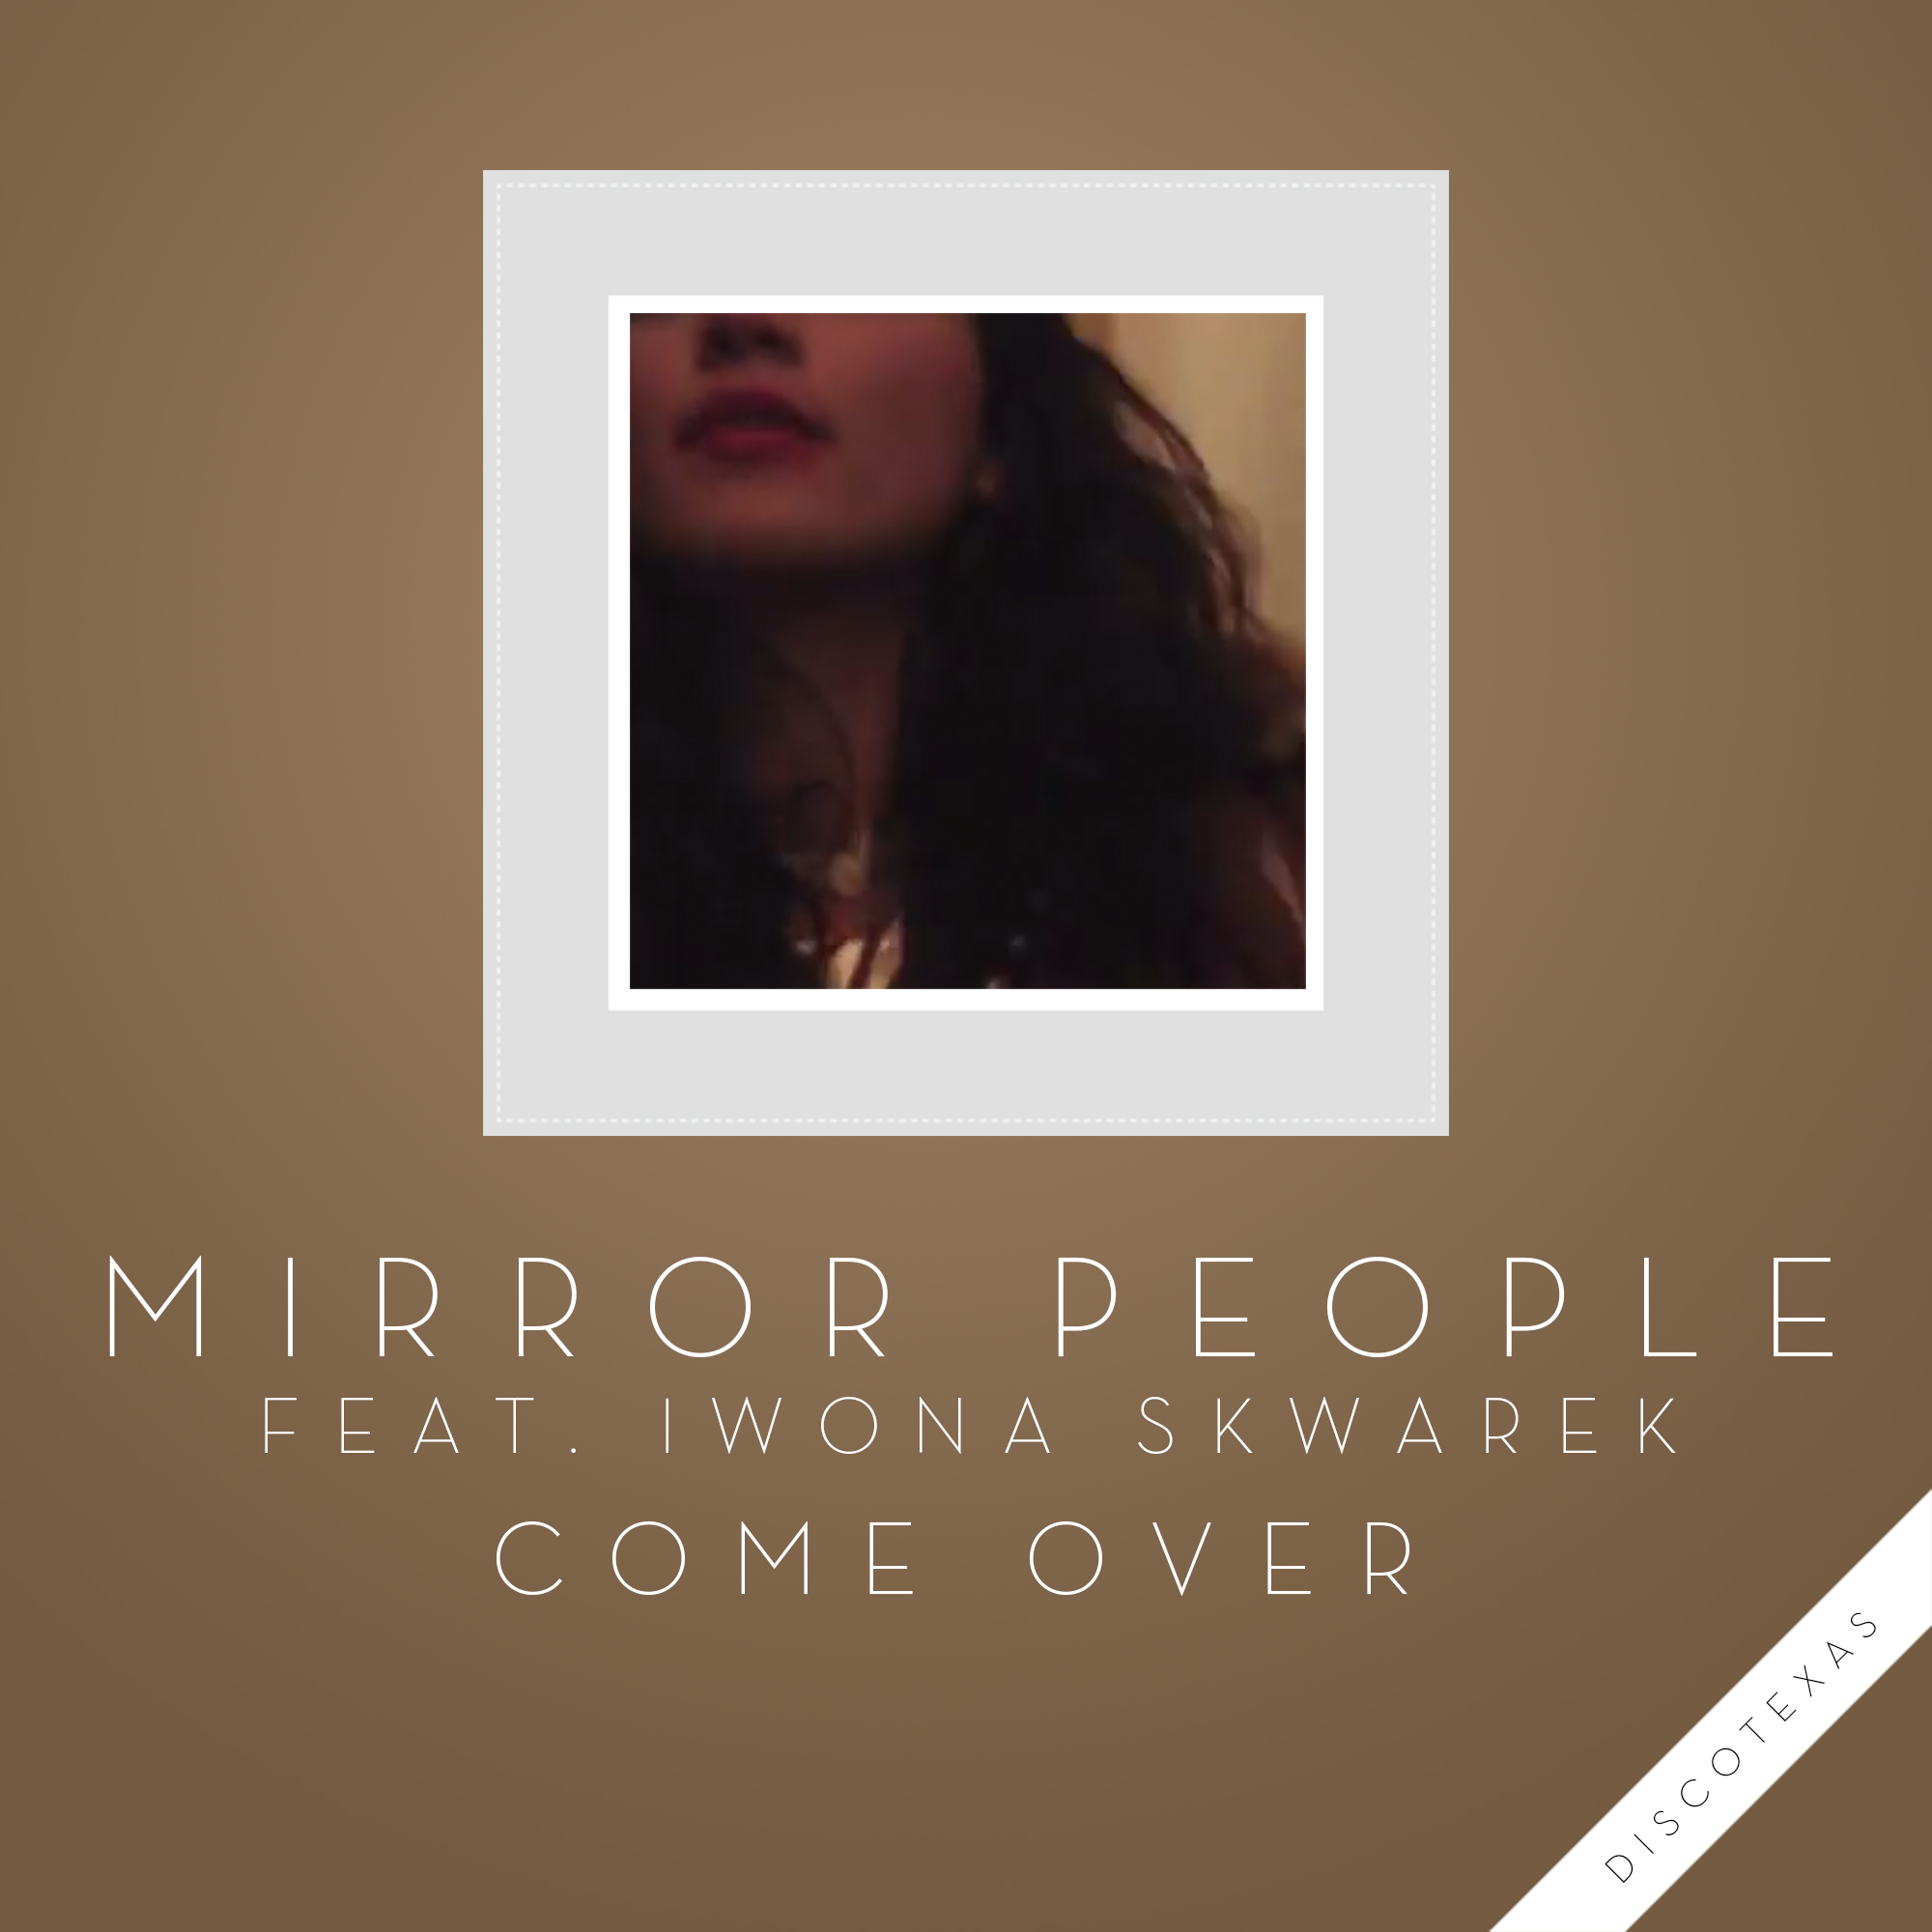 DT038: Mirror People feat. Iwona Skwarek